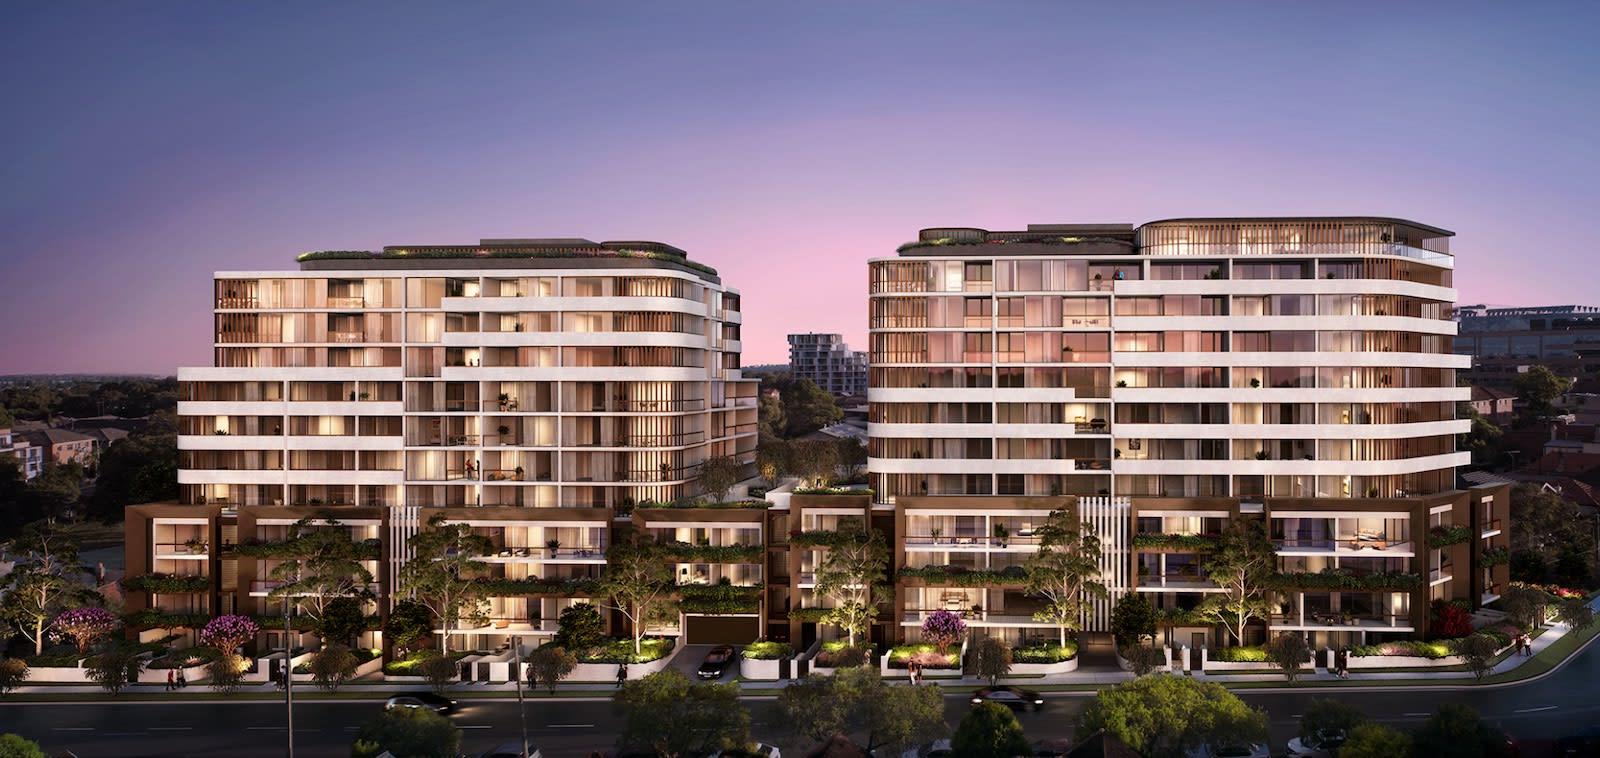 Developer Level 33 soon to complete owner-occupier driven Kogarah Central apartment development